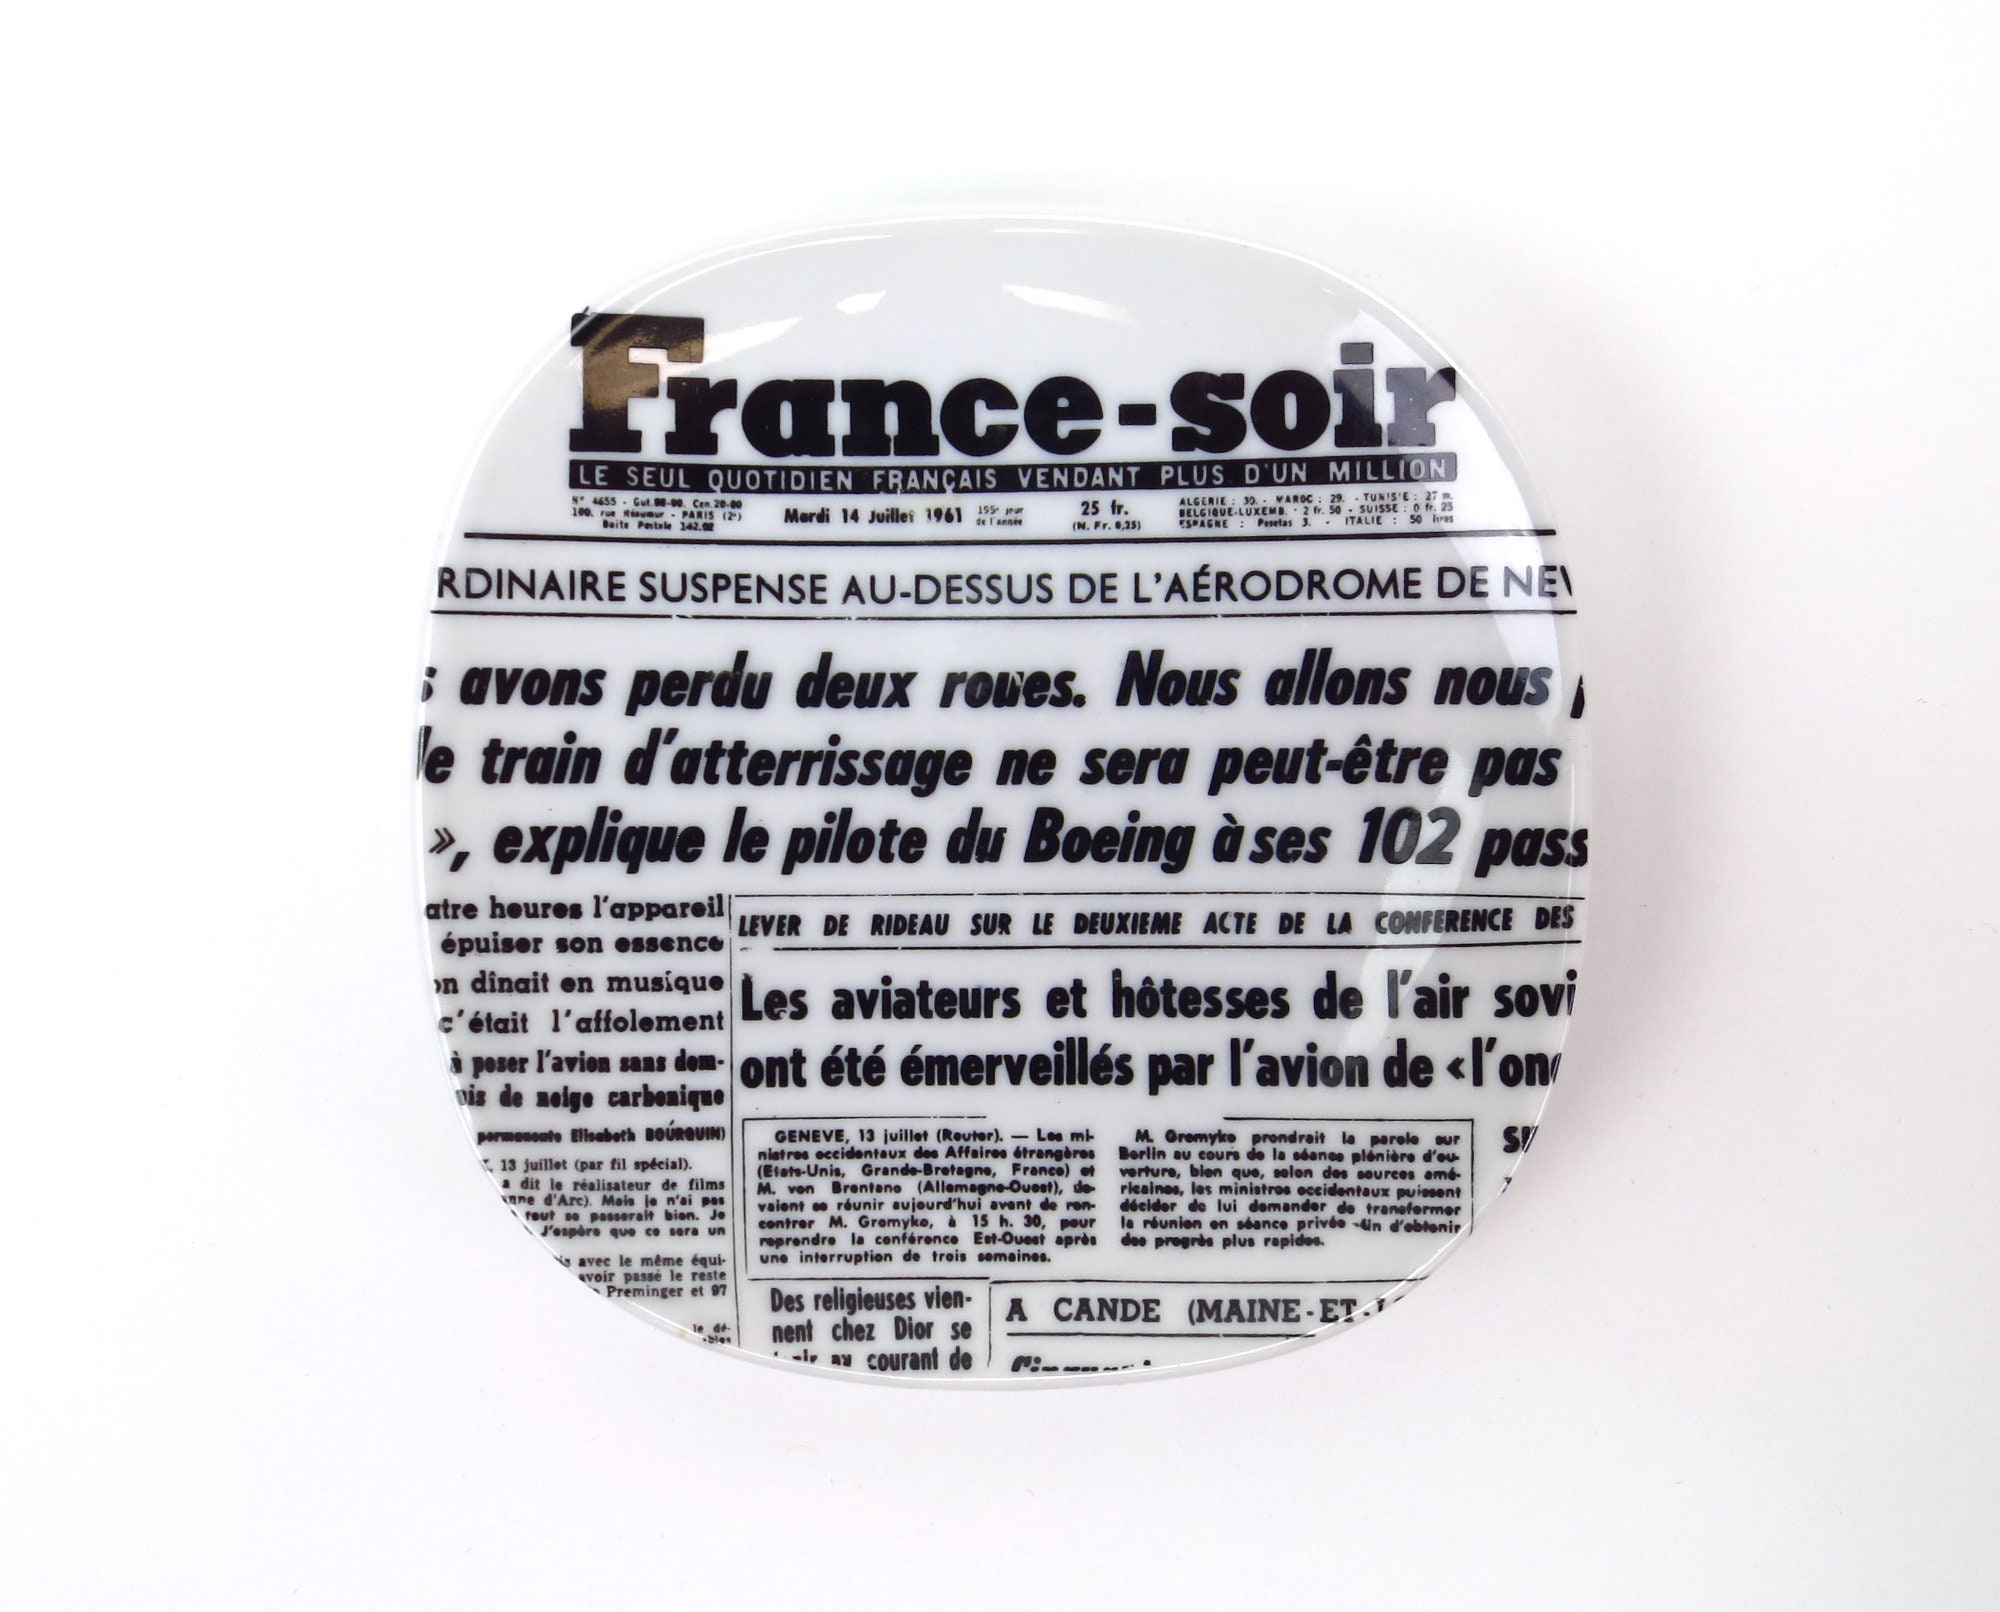 "Création De Rideaux Originaux vintage creation clary limoges france soir 5"" plate fornasetti style"